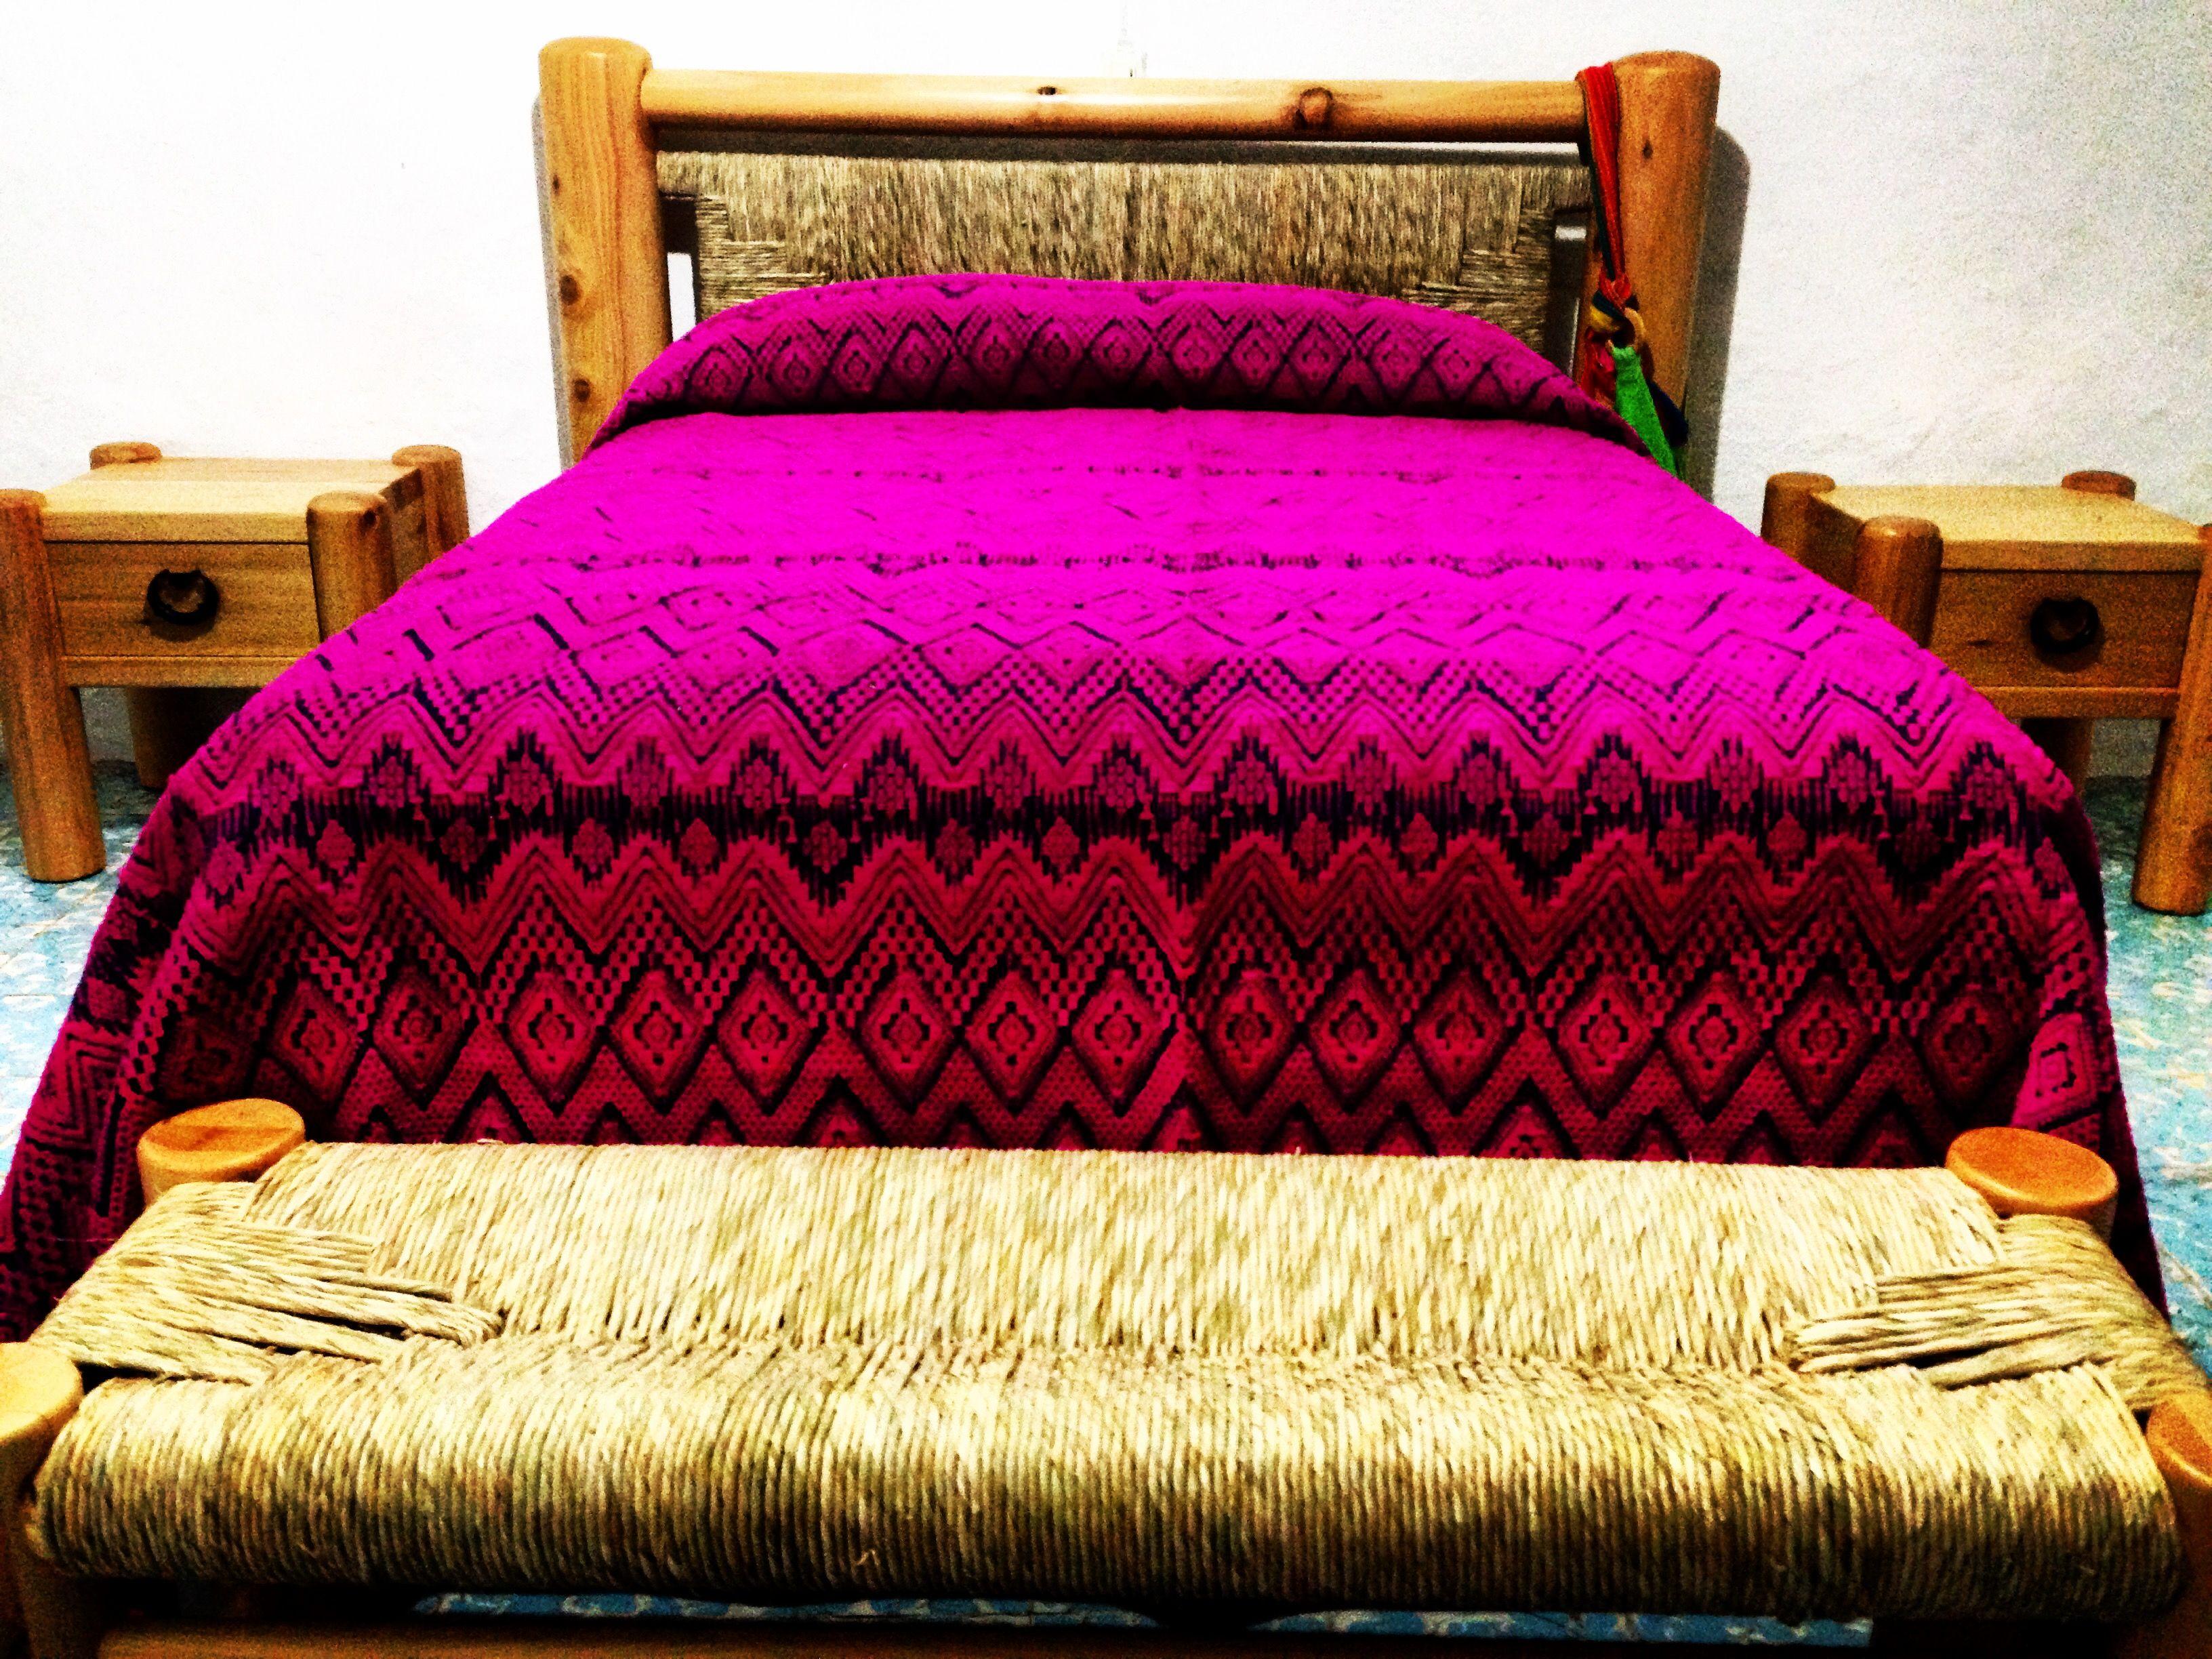 Colcha De Lana San Crist Bal De Las Casas Chiapas Muebles De La  # Muebles Queretaro